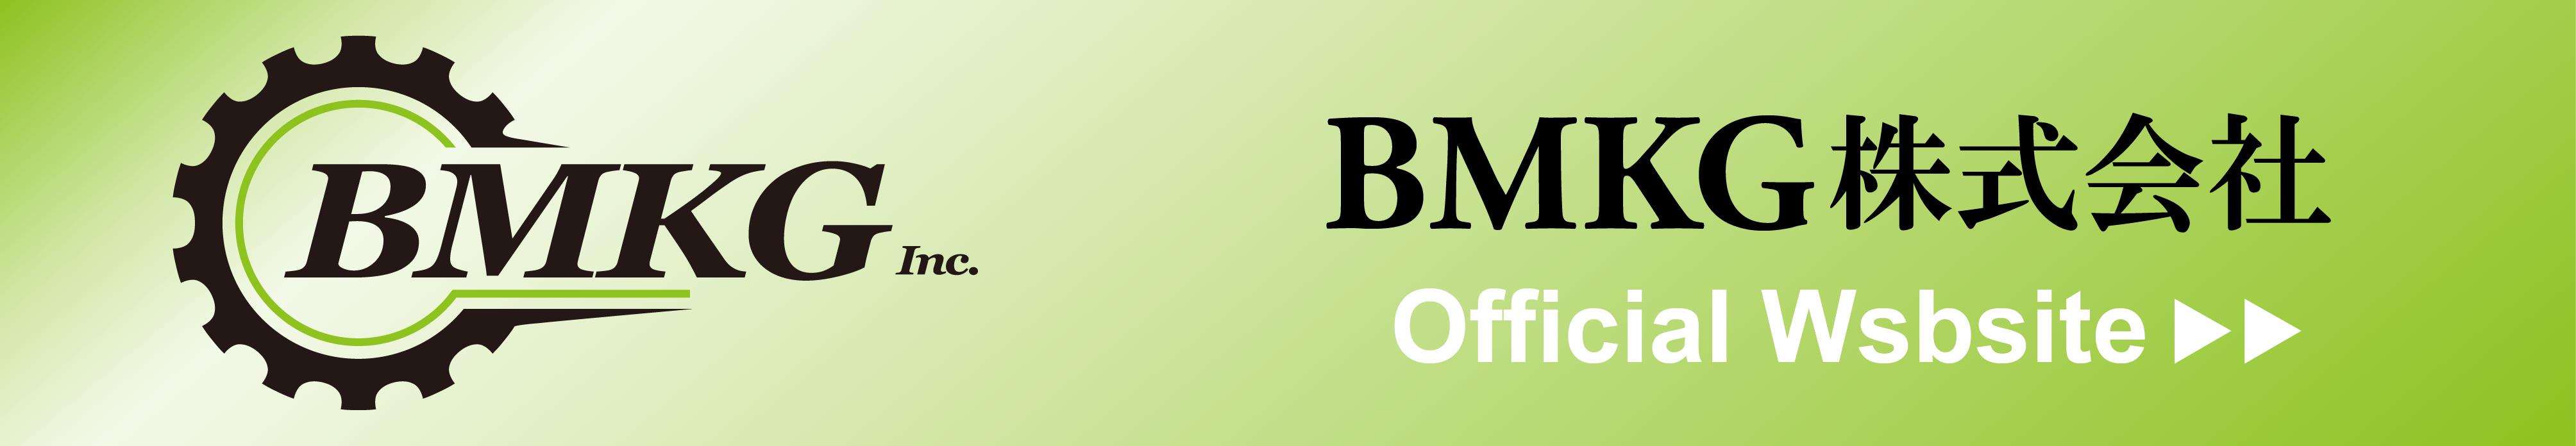 BMKG株式会社 オフィシャルウェブサイト